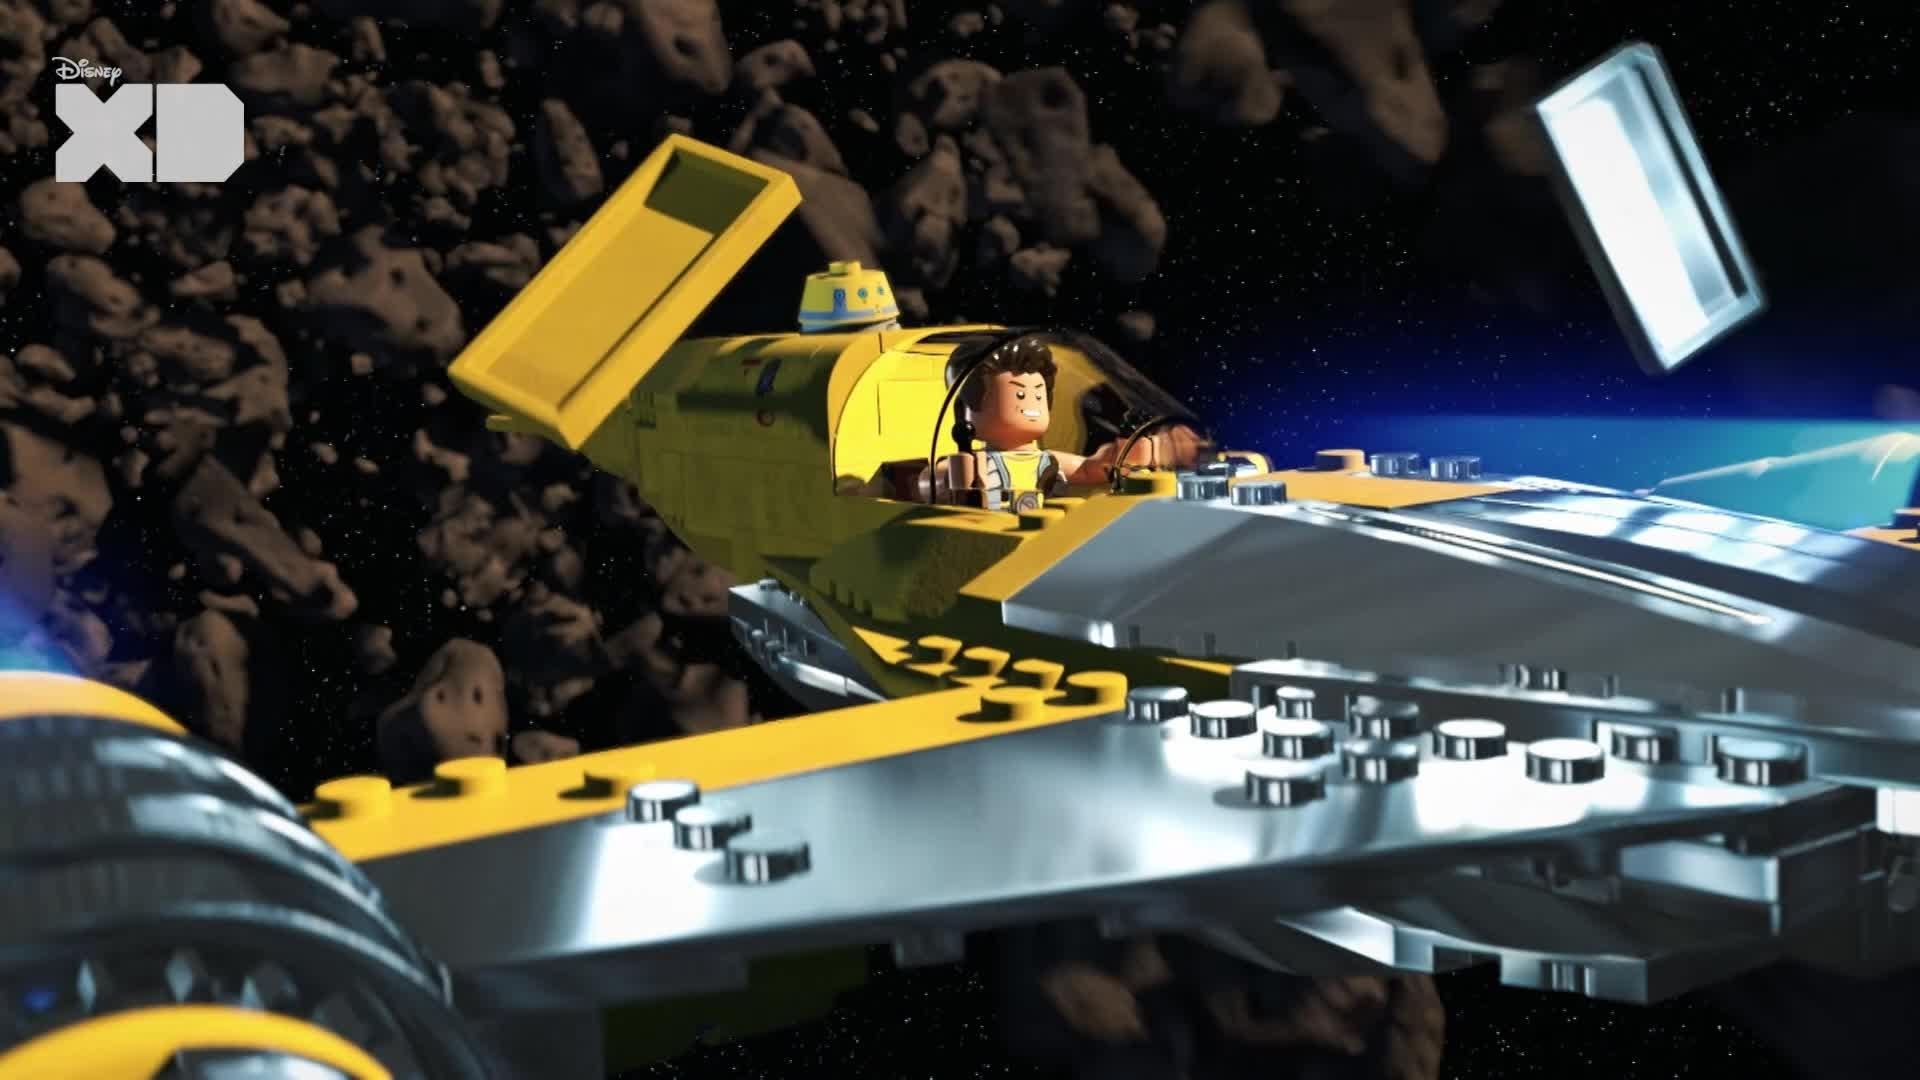 Zander's Space Trip